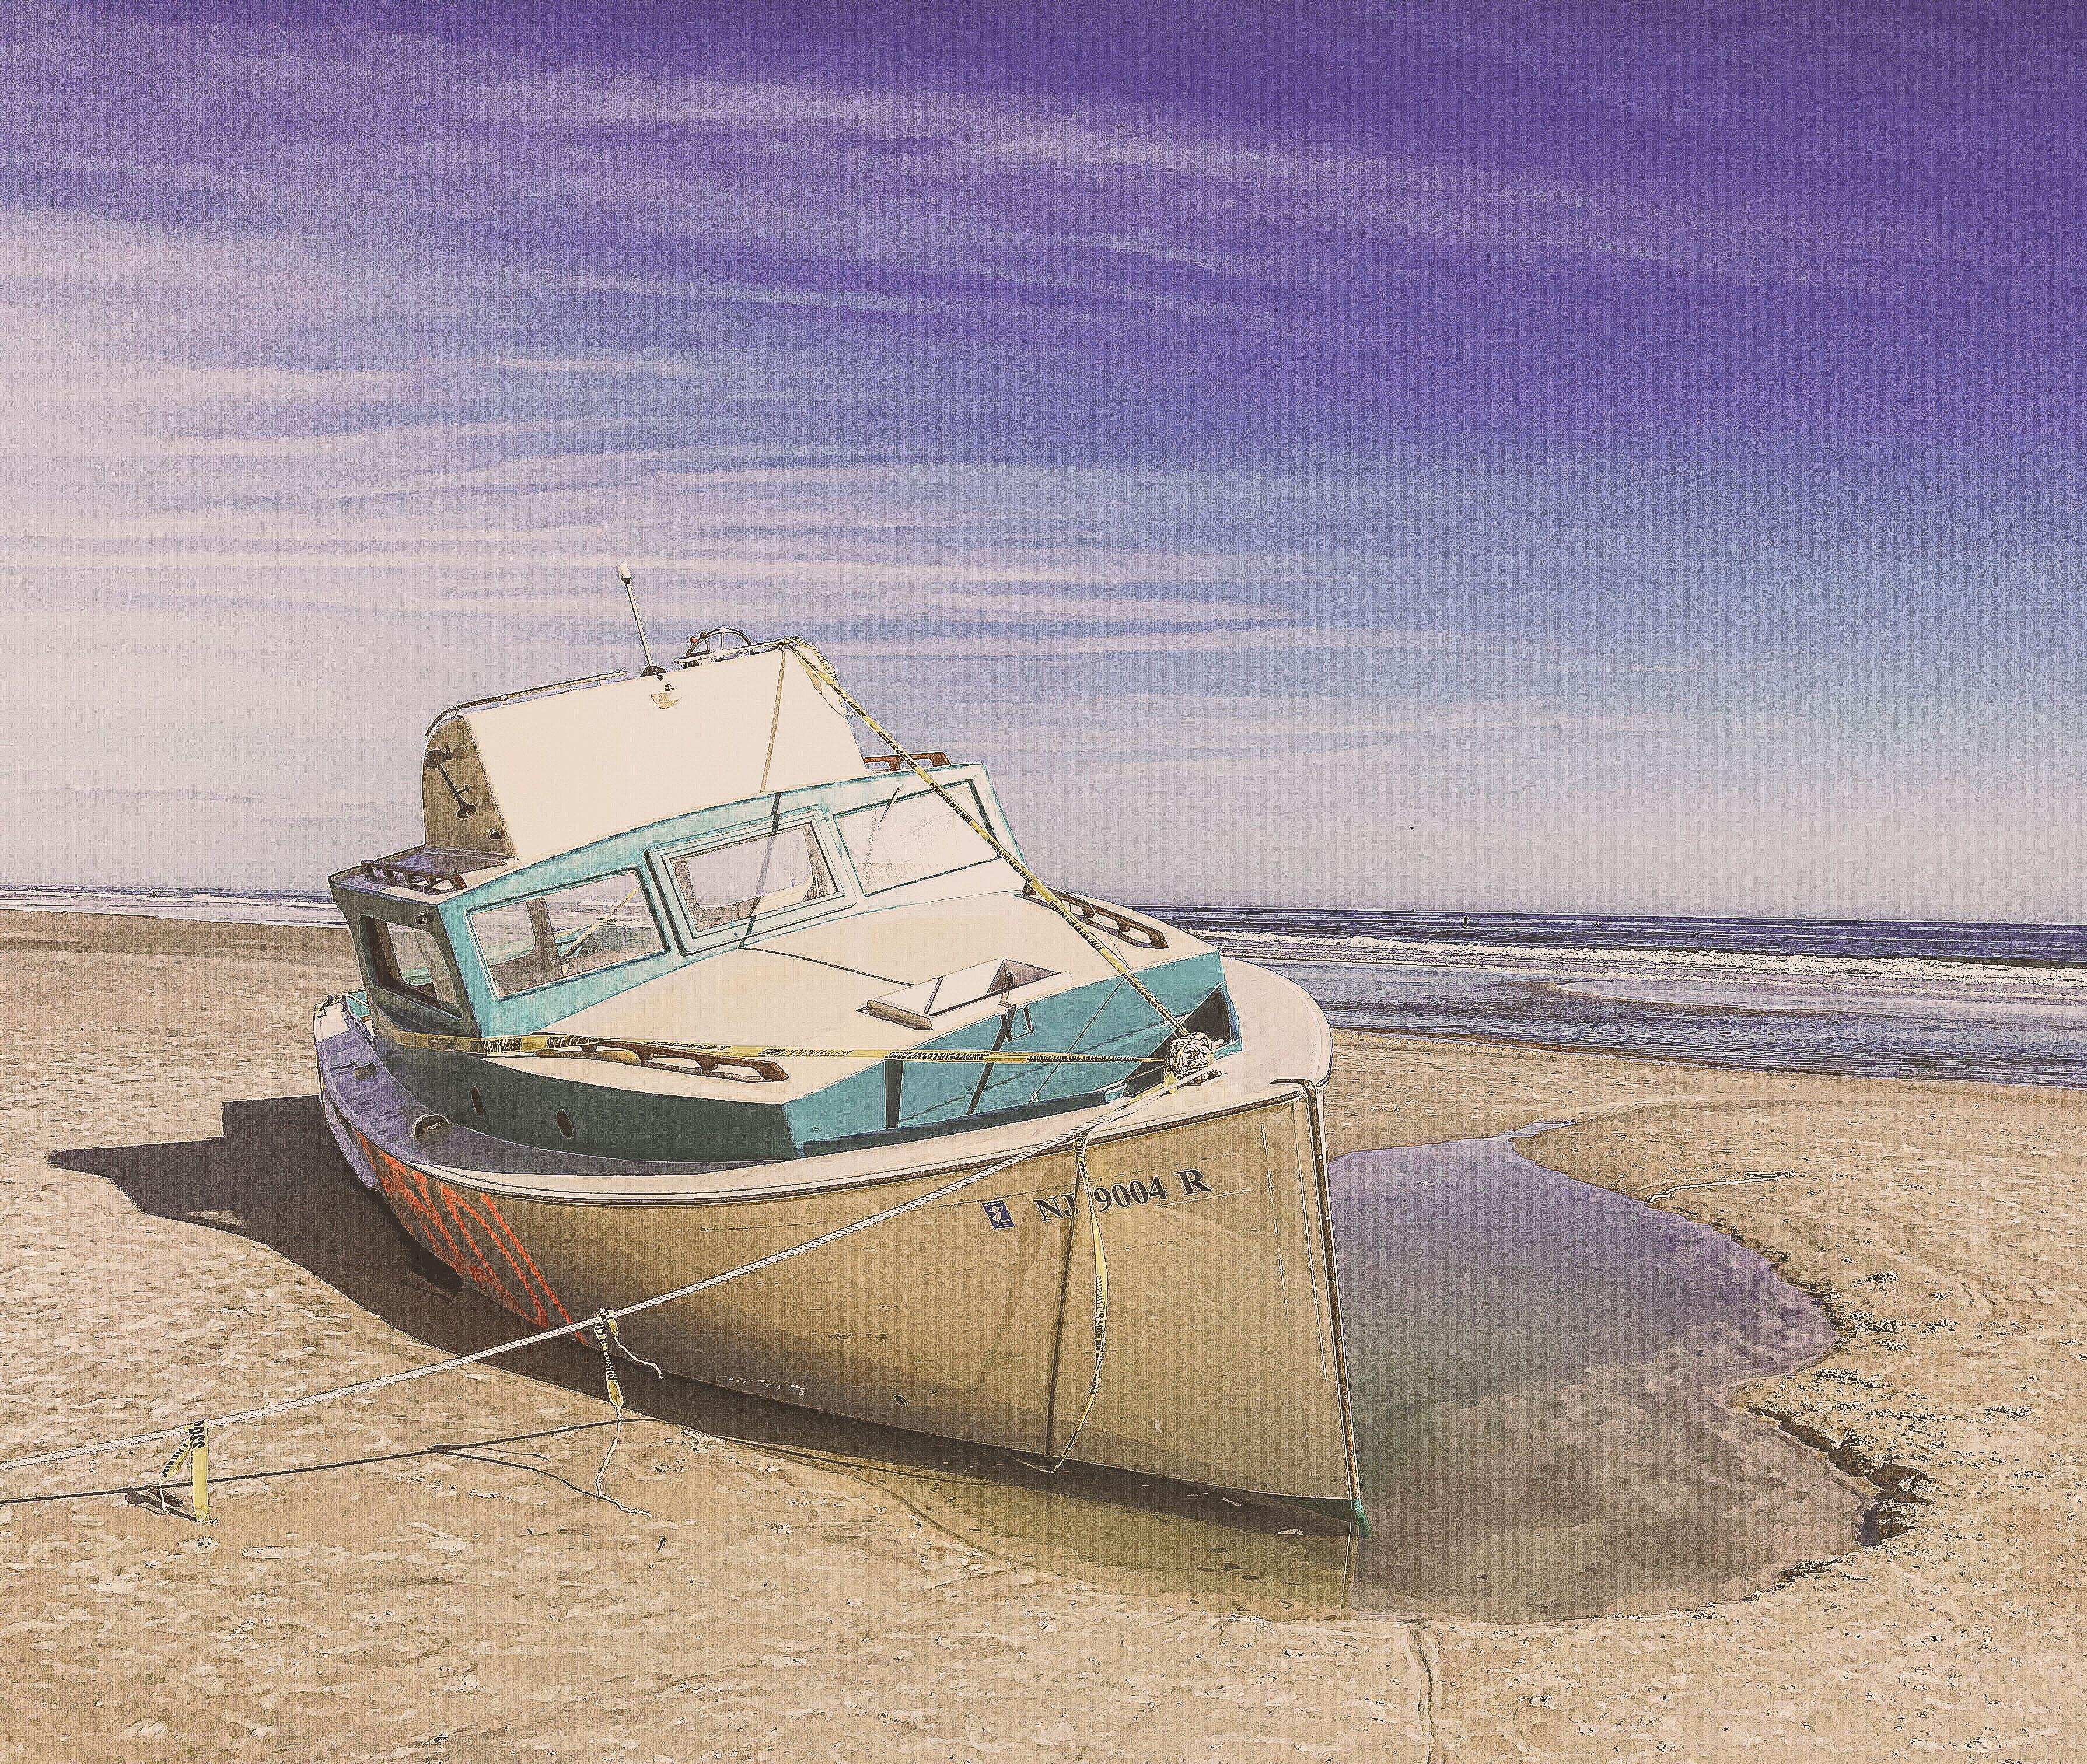 Gratis arkivbilde med båt, bølger, dagslys, hav